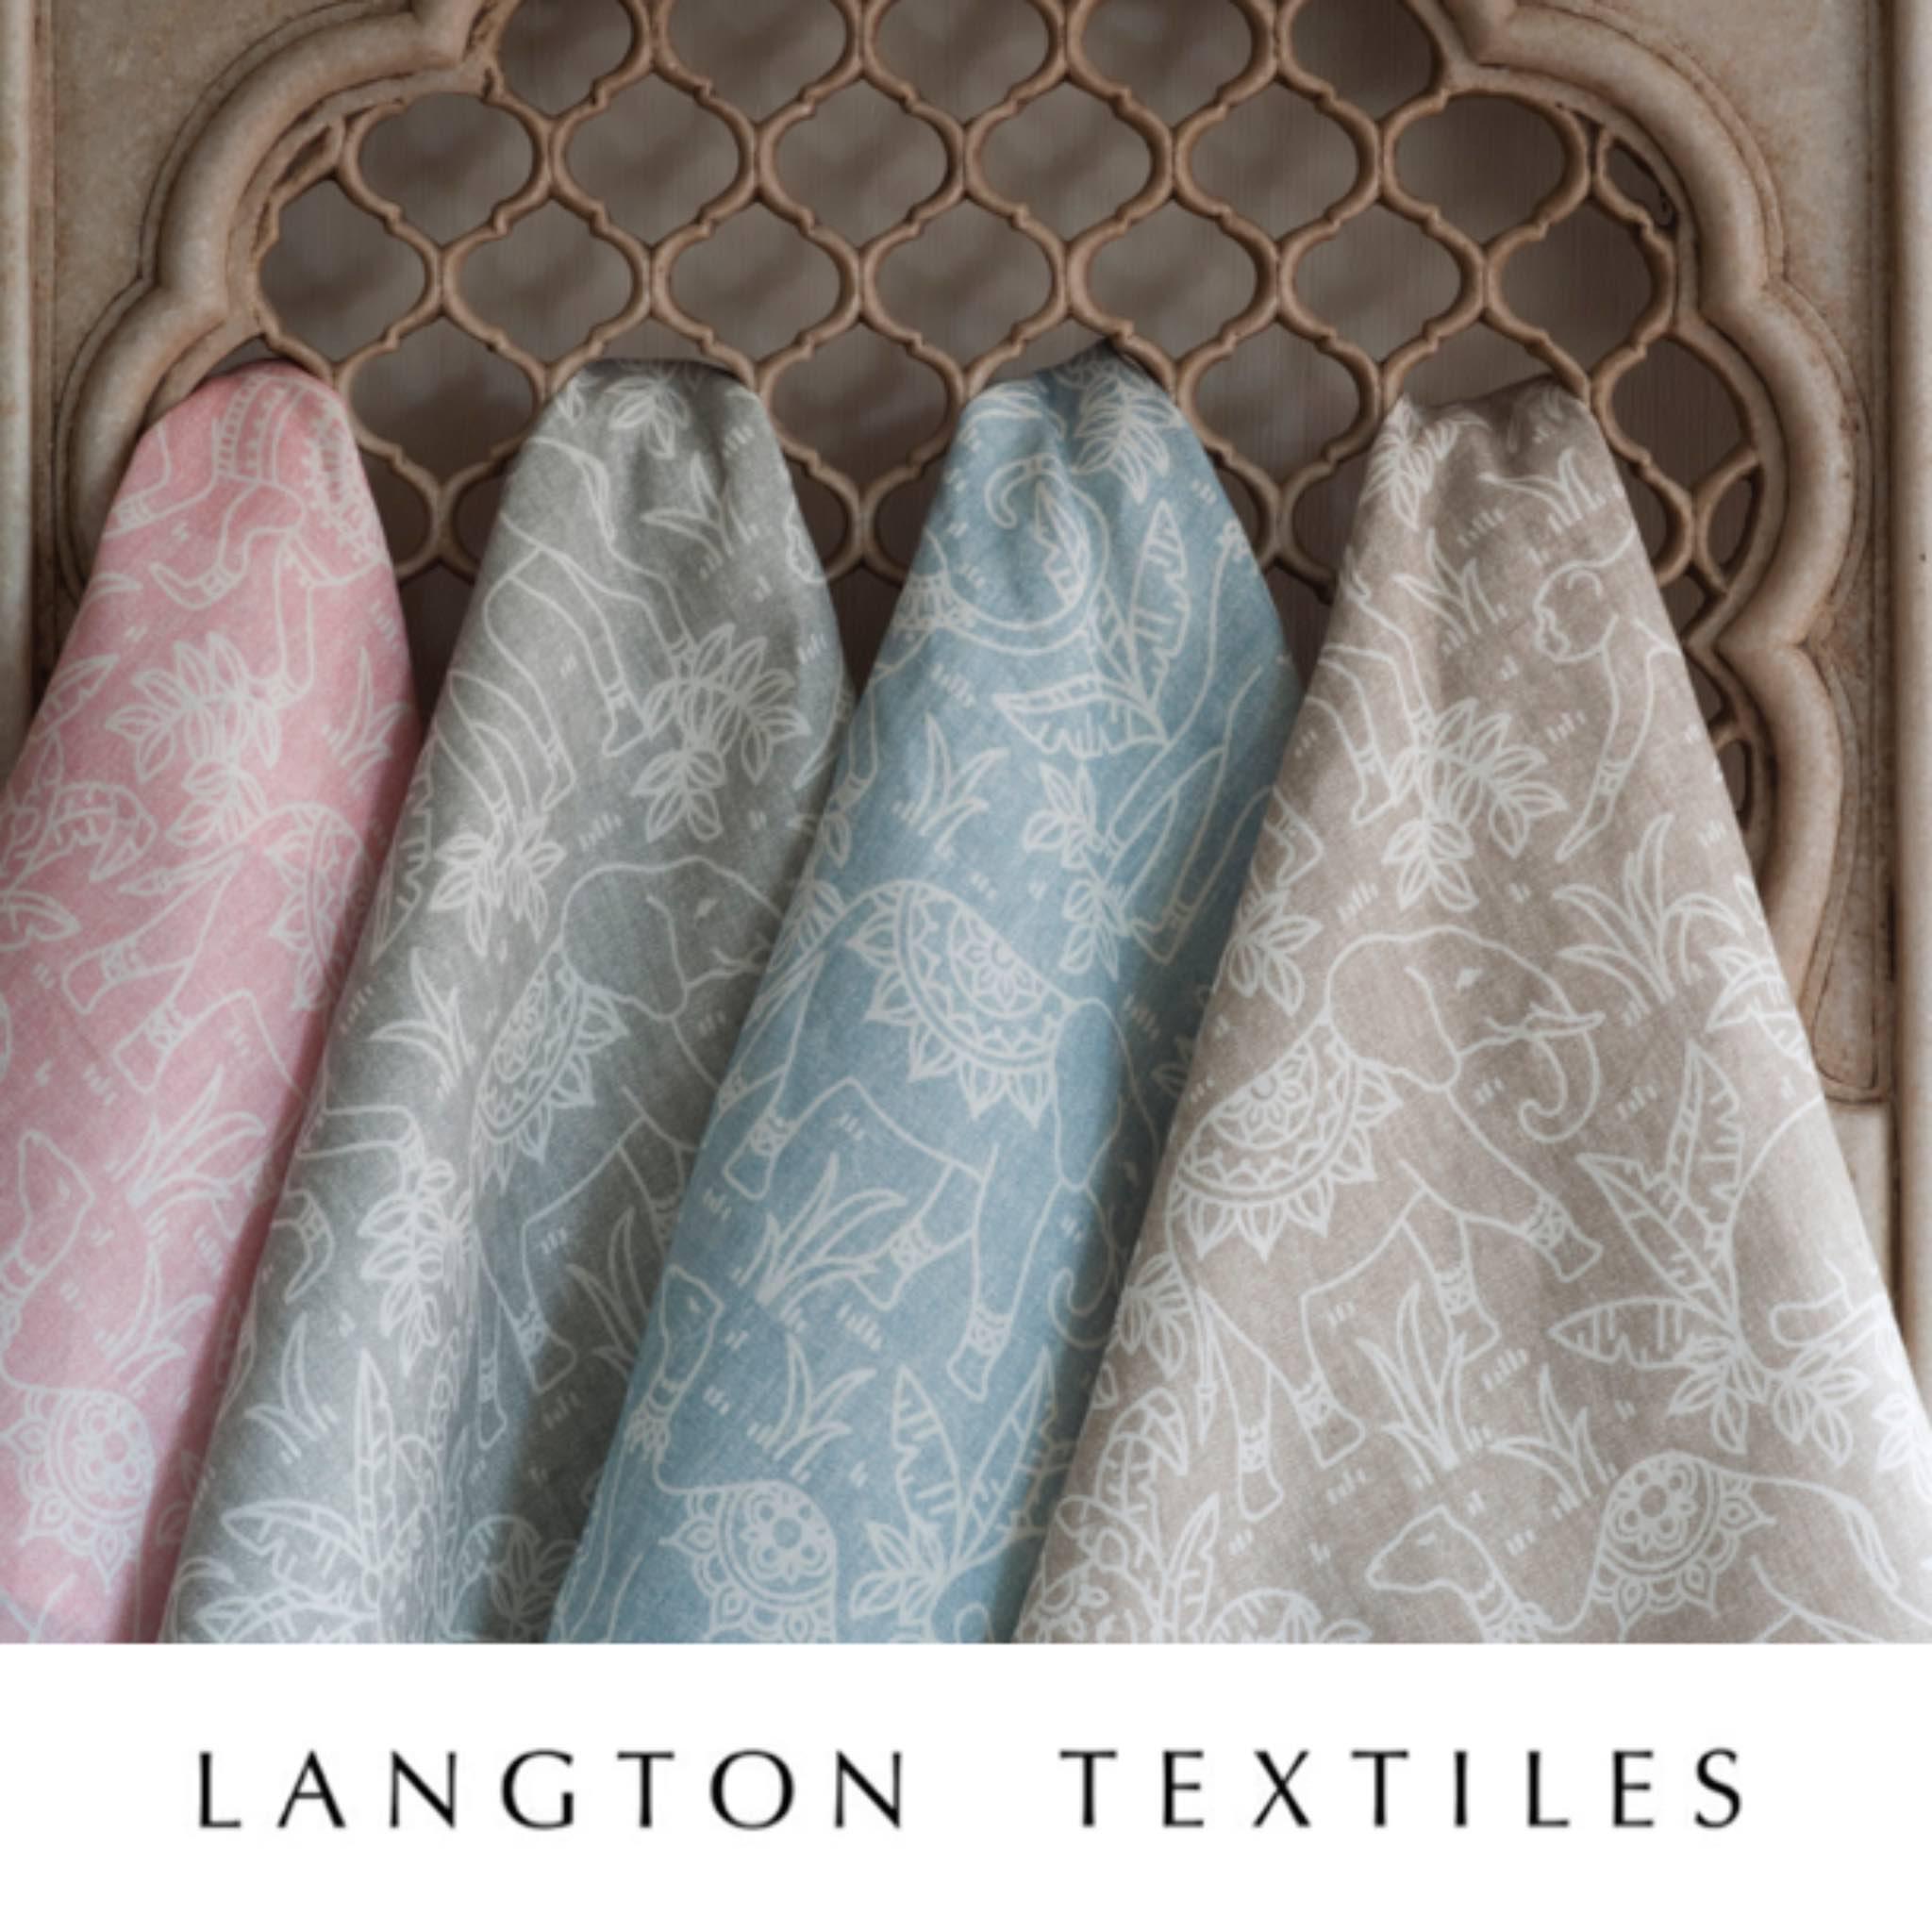 LANGTON TEXTILES.jpg